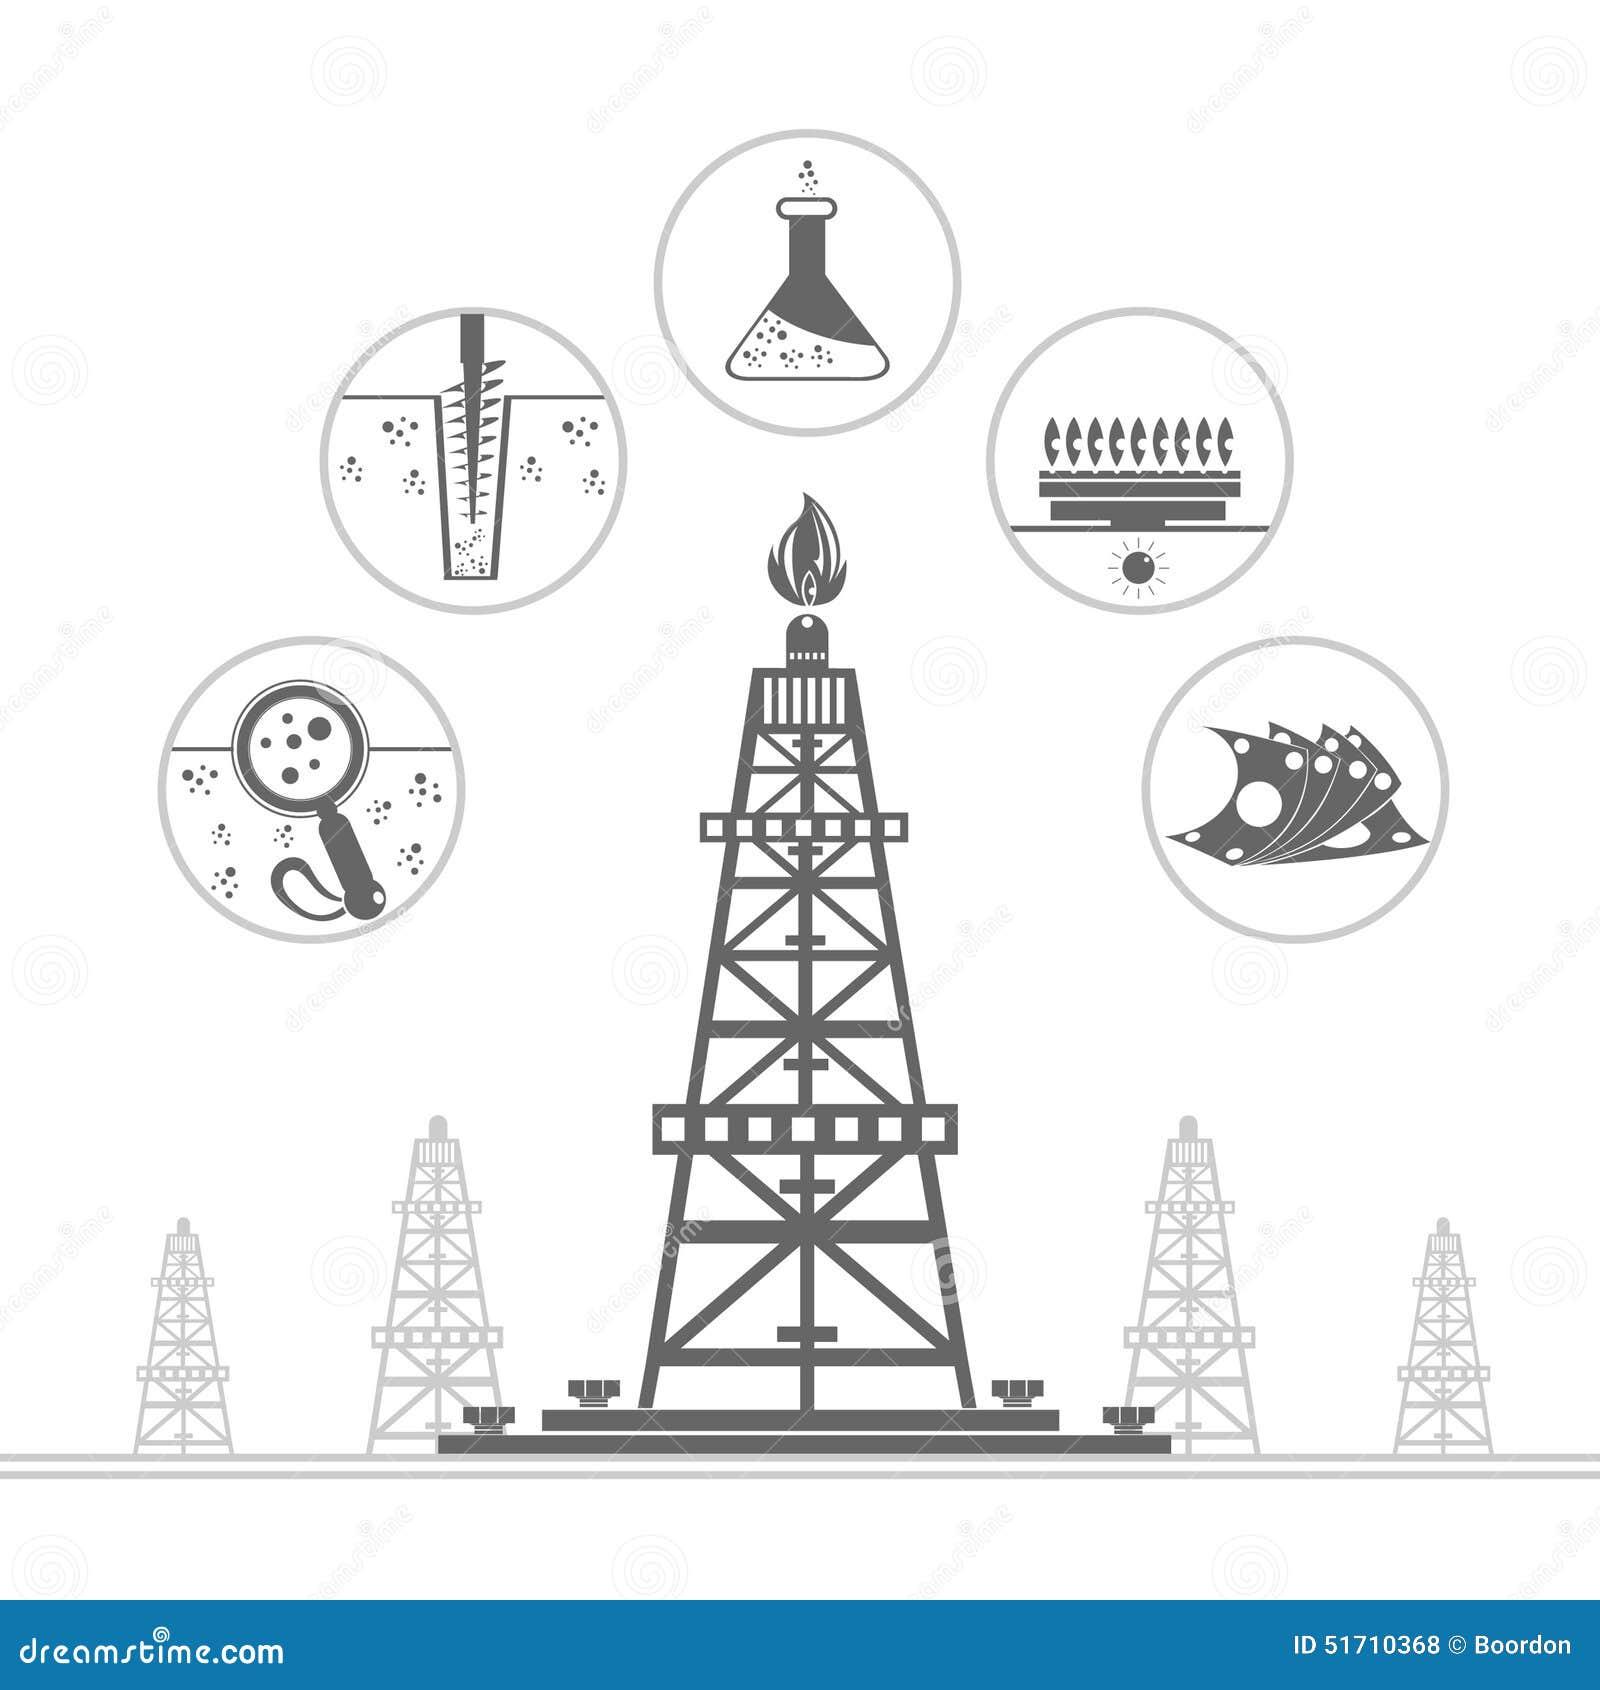 mining process diagram